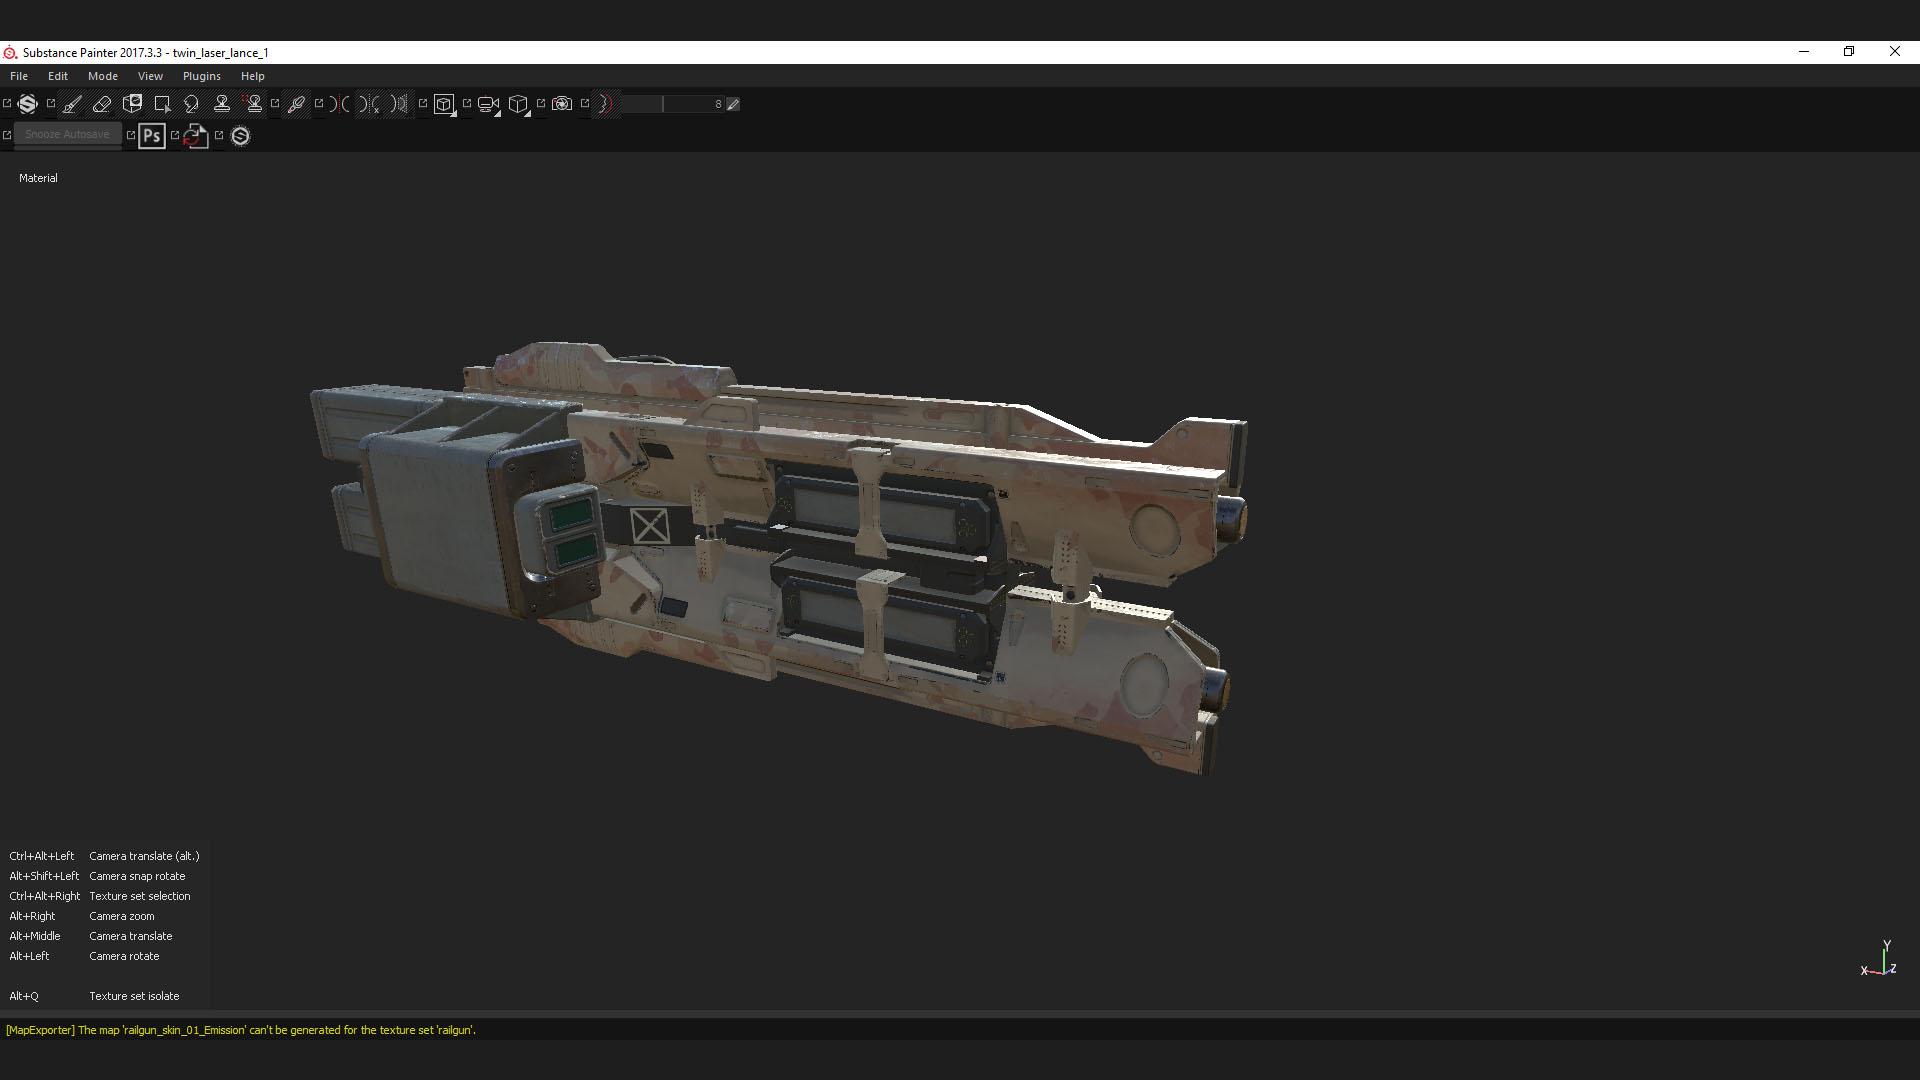 T2 laser lance